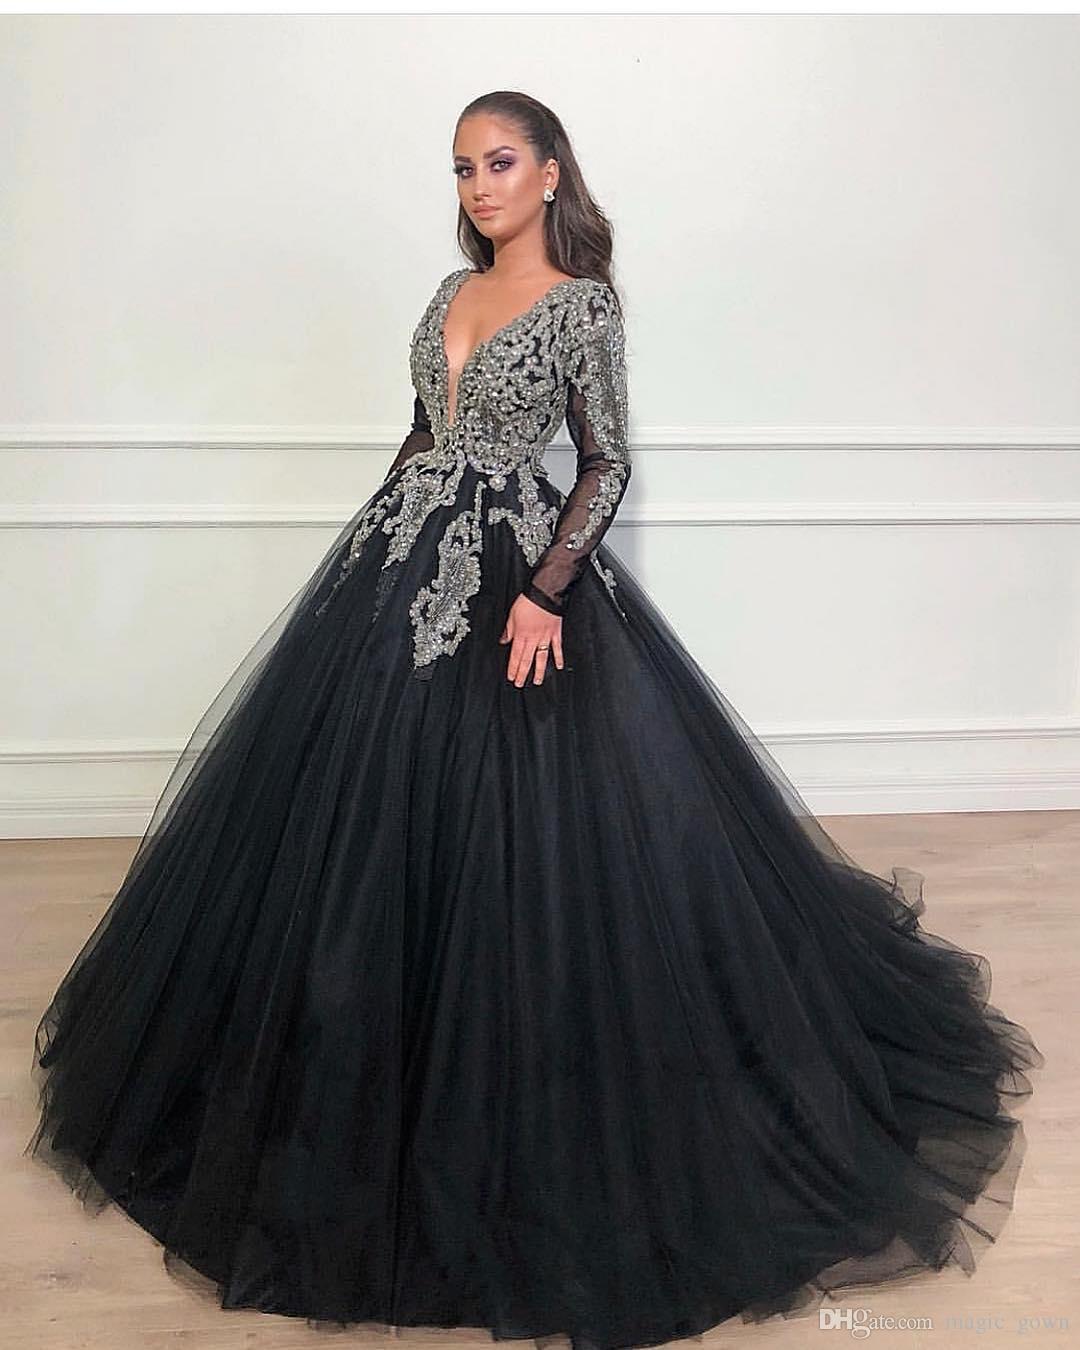 Dubai árabe Black Ball Gown Prom Dresses V Neck mangas compridas lantejoulas Beads Lace Applique doce 16 Dresses Quinceanera Vestidos Vestidos